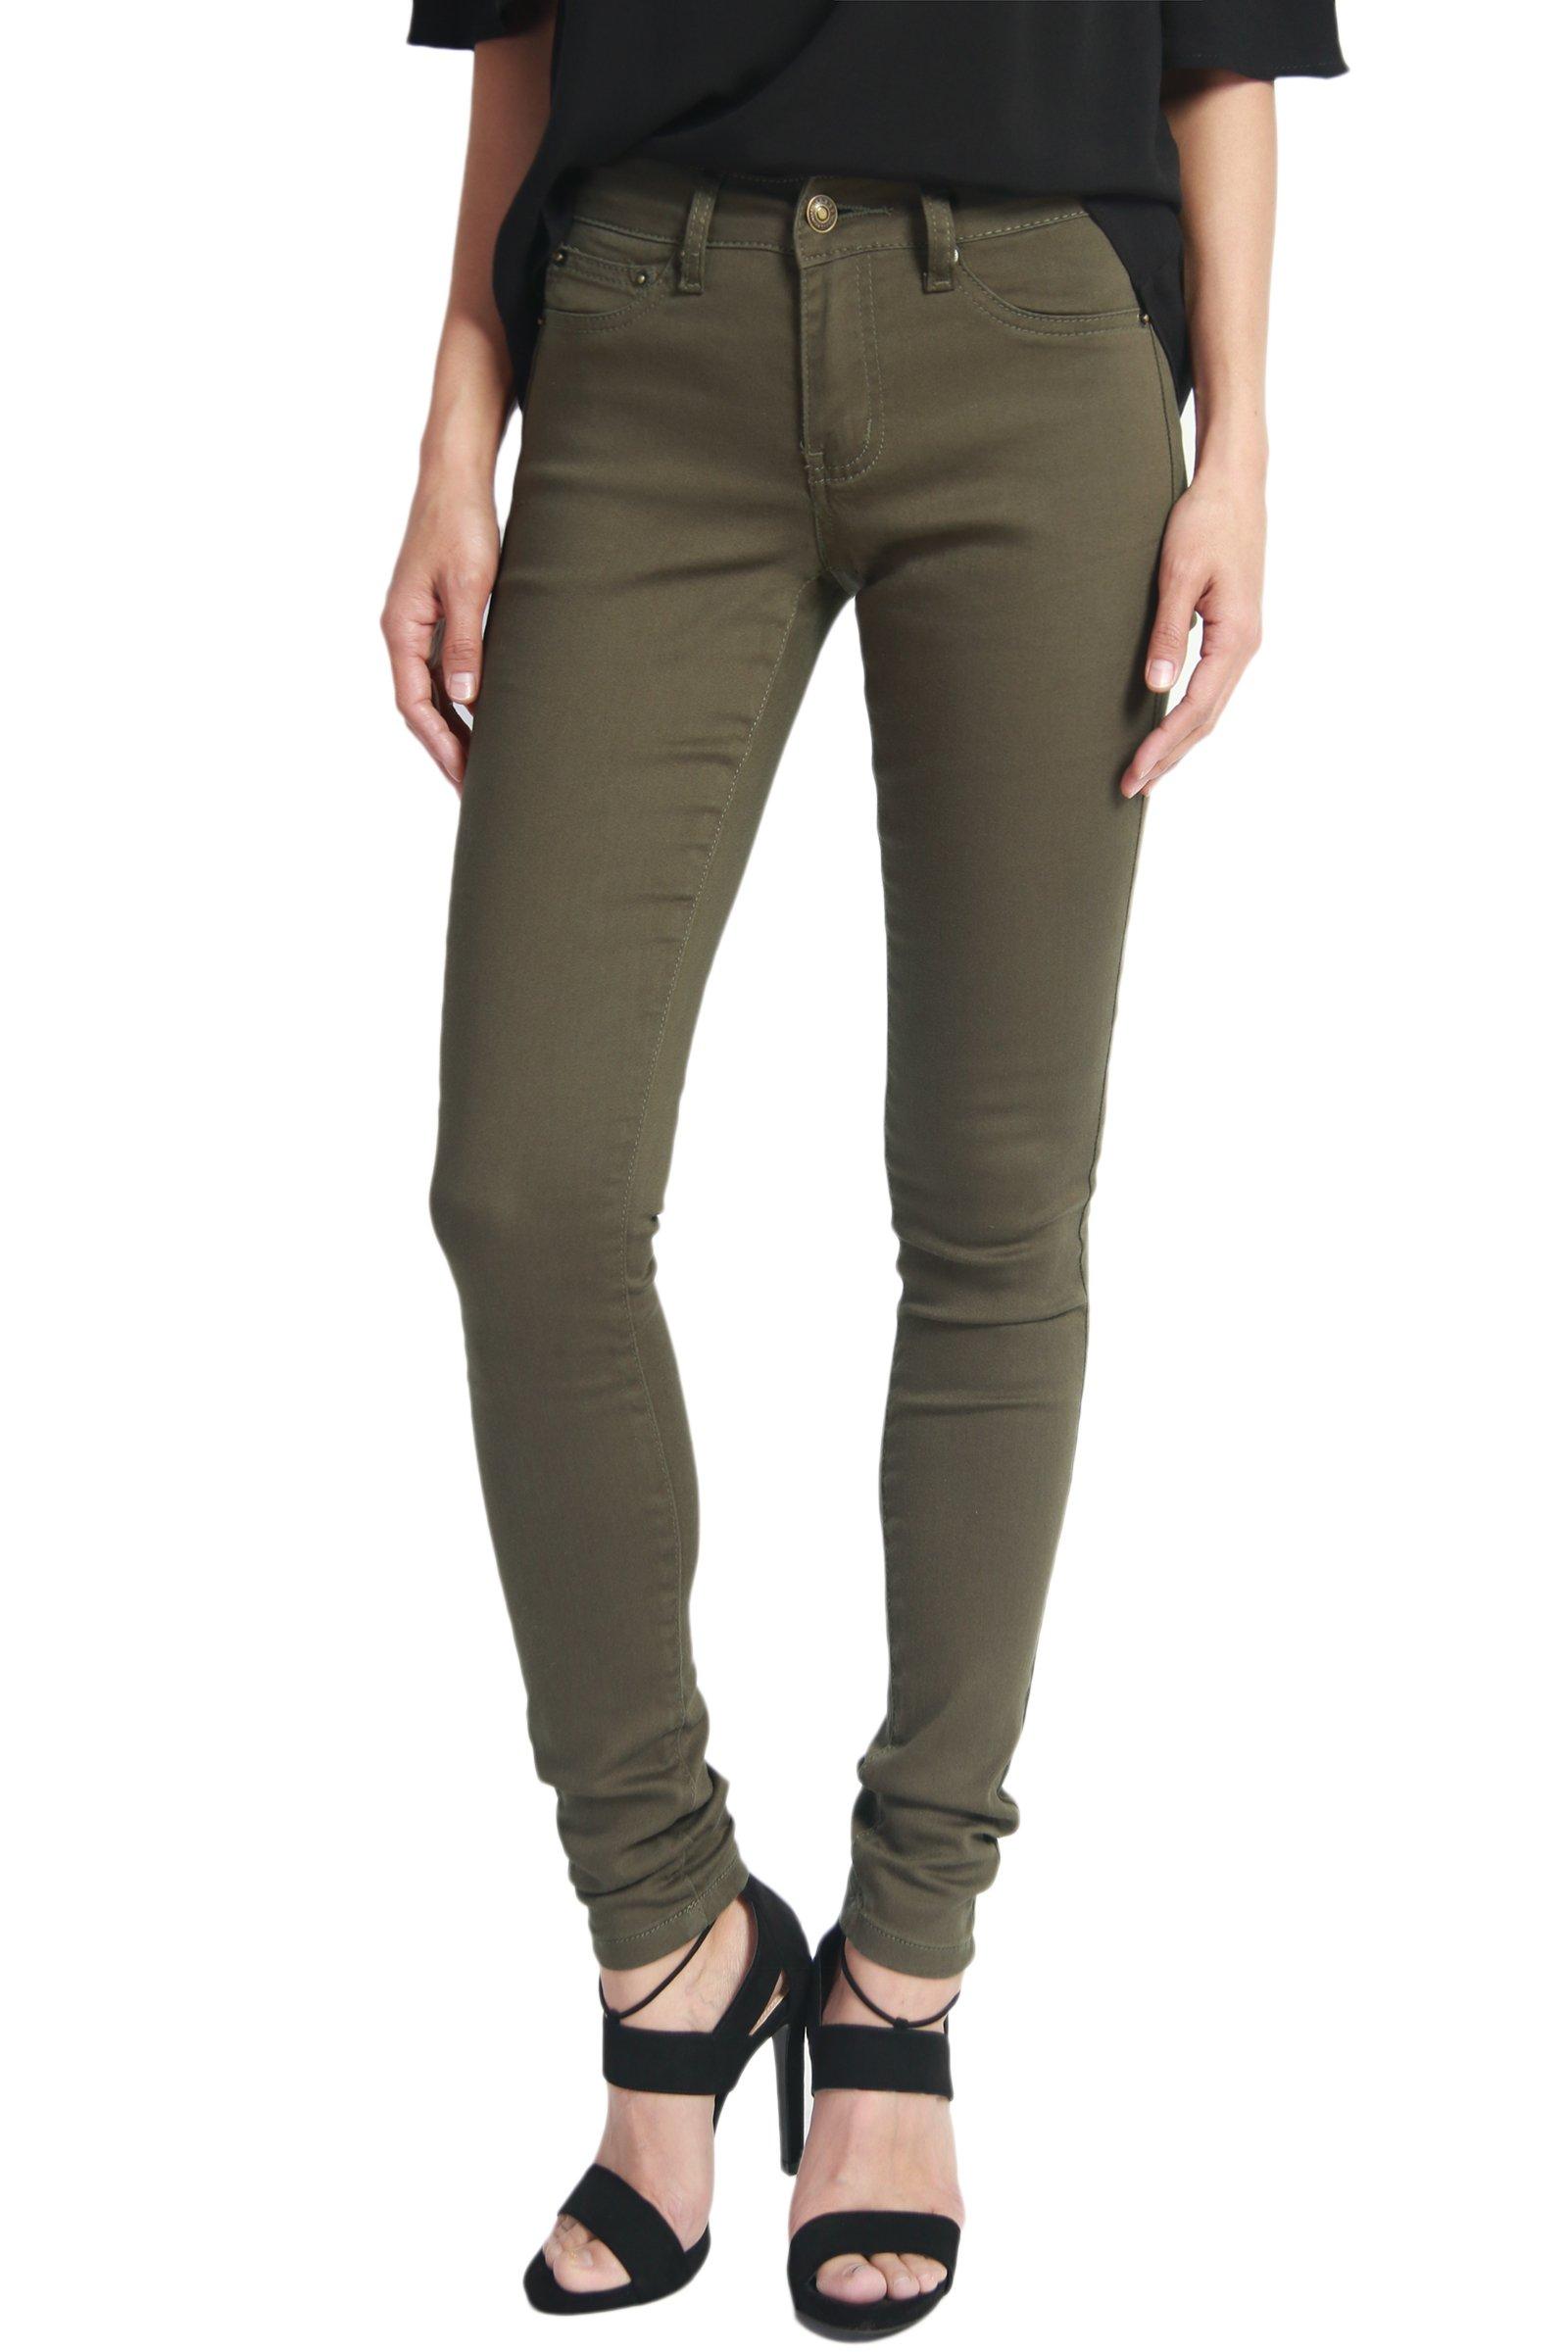 TheMogan Women's Army Olive Green 5 Pocket Stretch Denim Skinny Jeans Olive 1